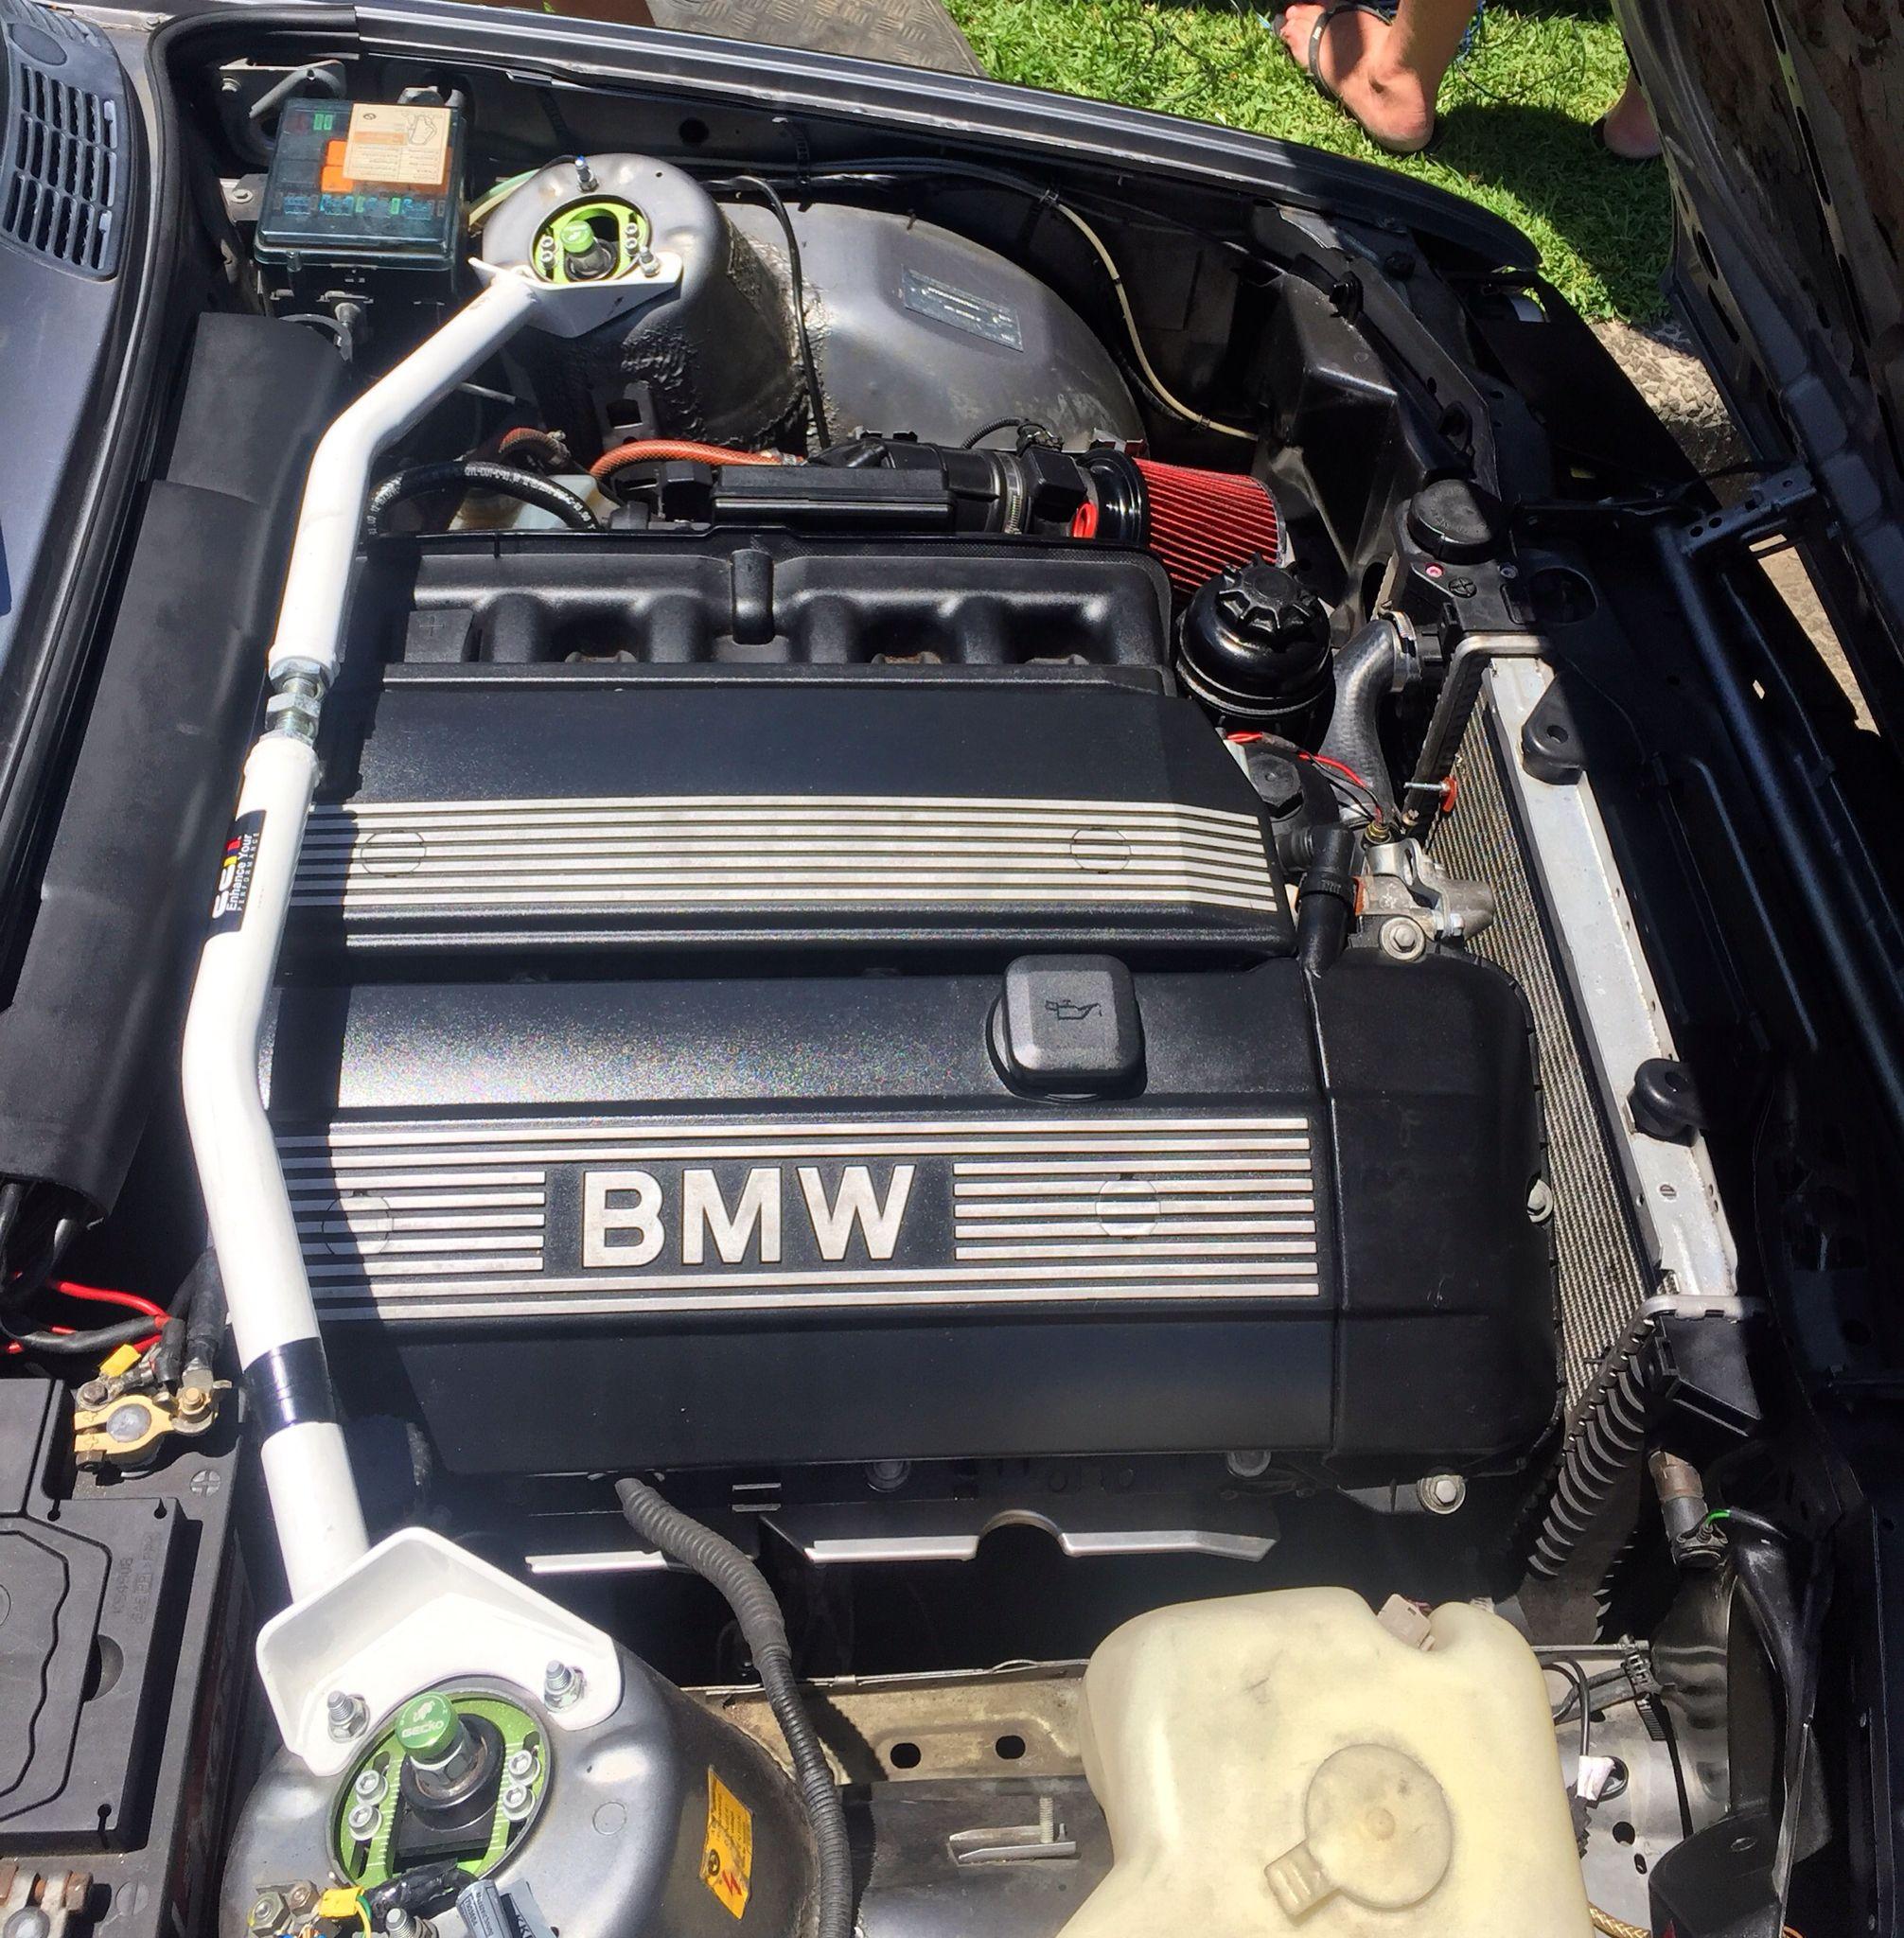 1990 Bmw E30 M54 Swapped Engine Bay Coilovers Ultra Racing Strut Brace Bmw M54 Bmw Engines Bmw E30